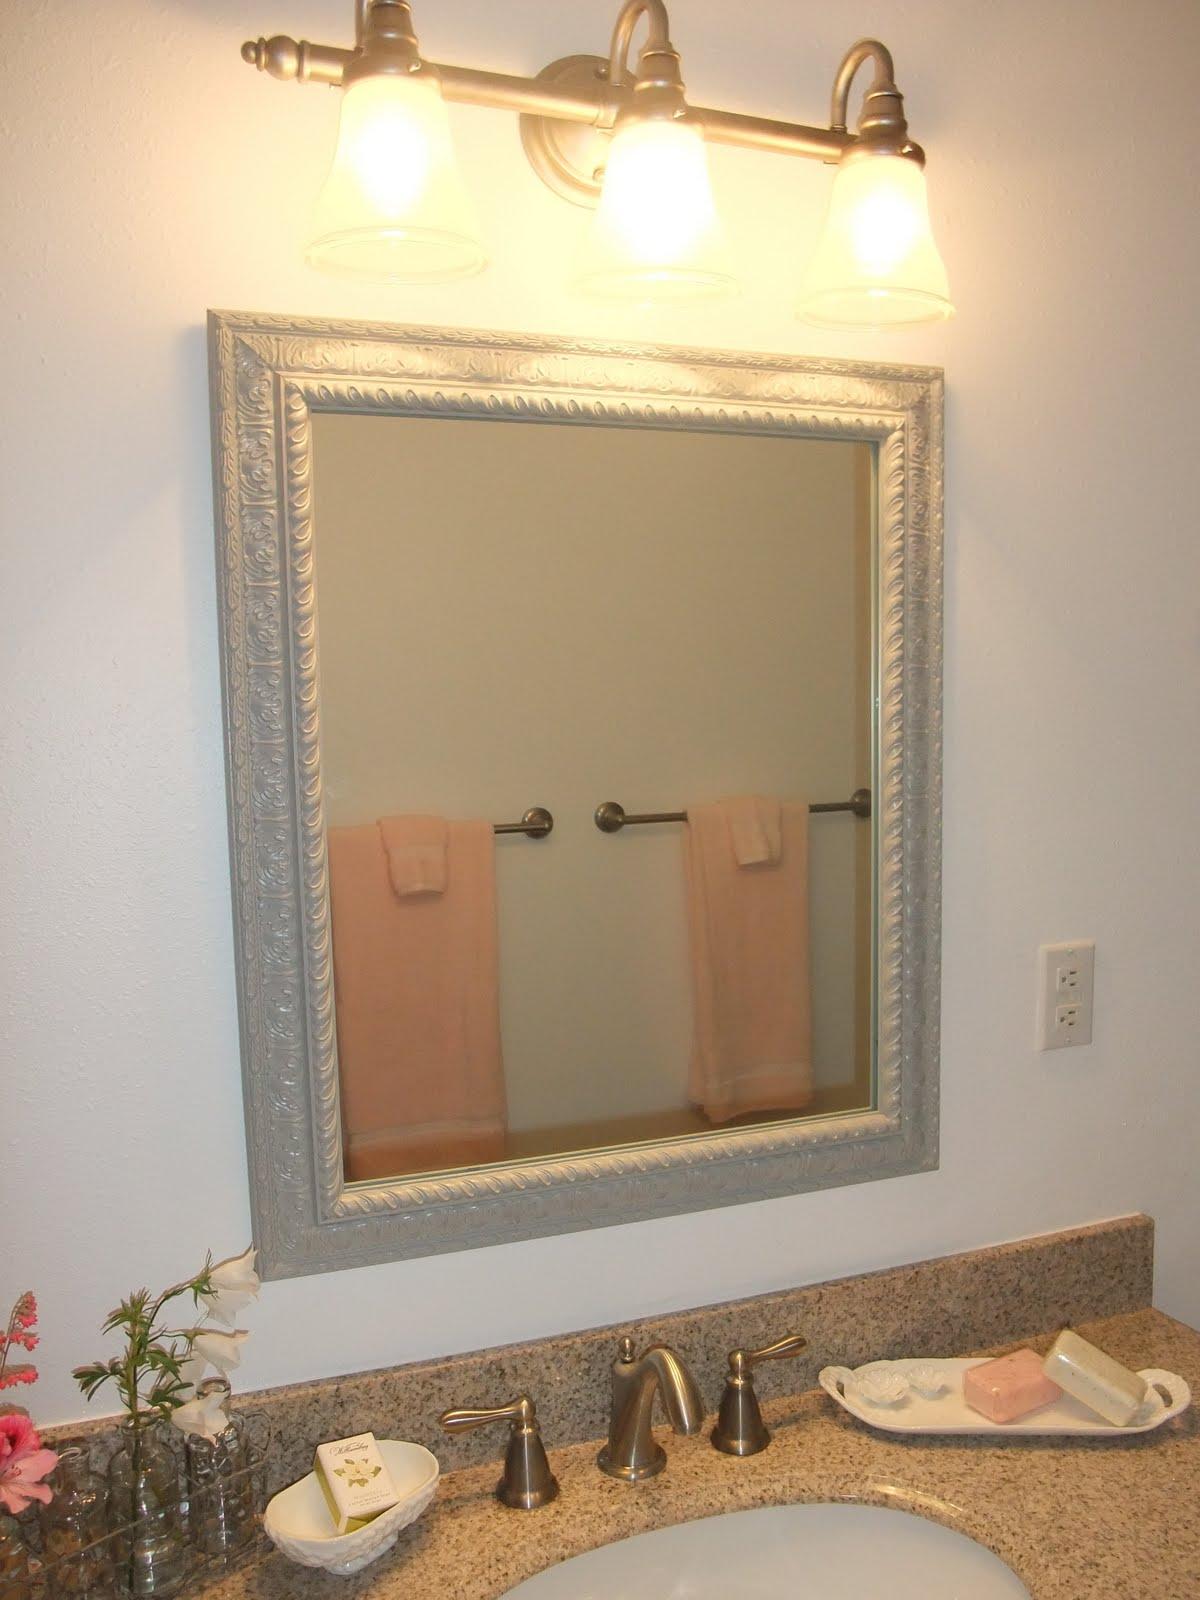 Just another hang up bathroom redo for Redoing bathroom walls